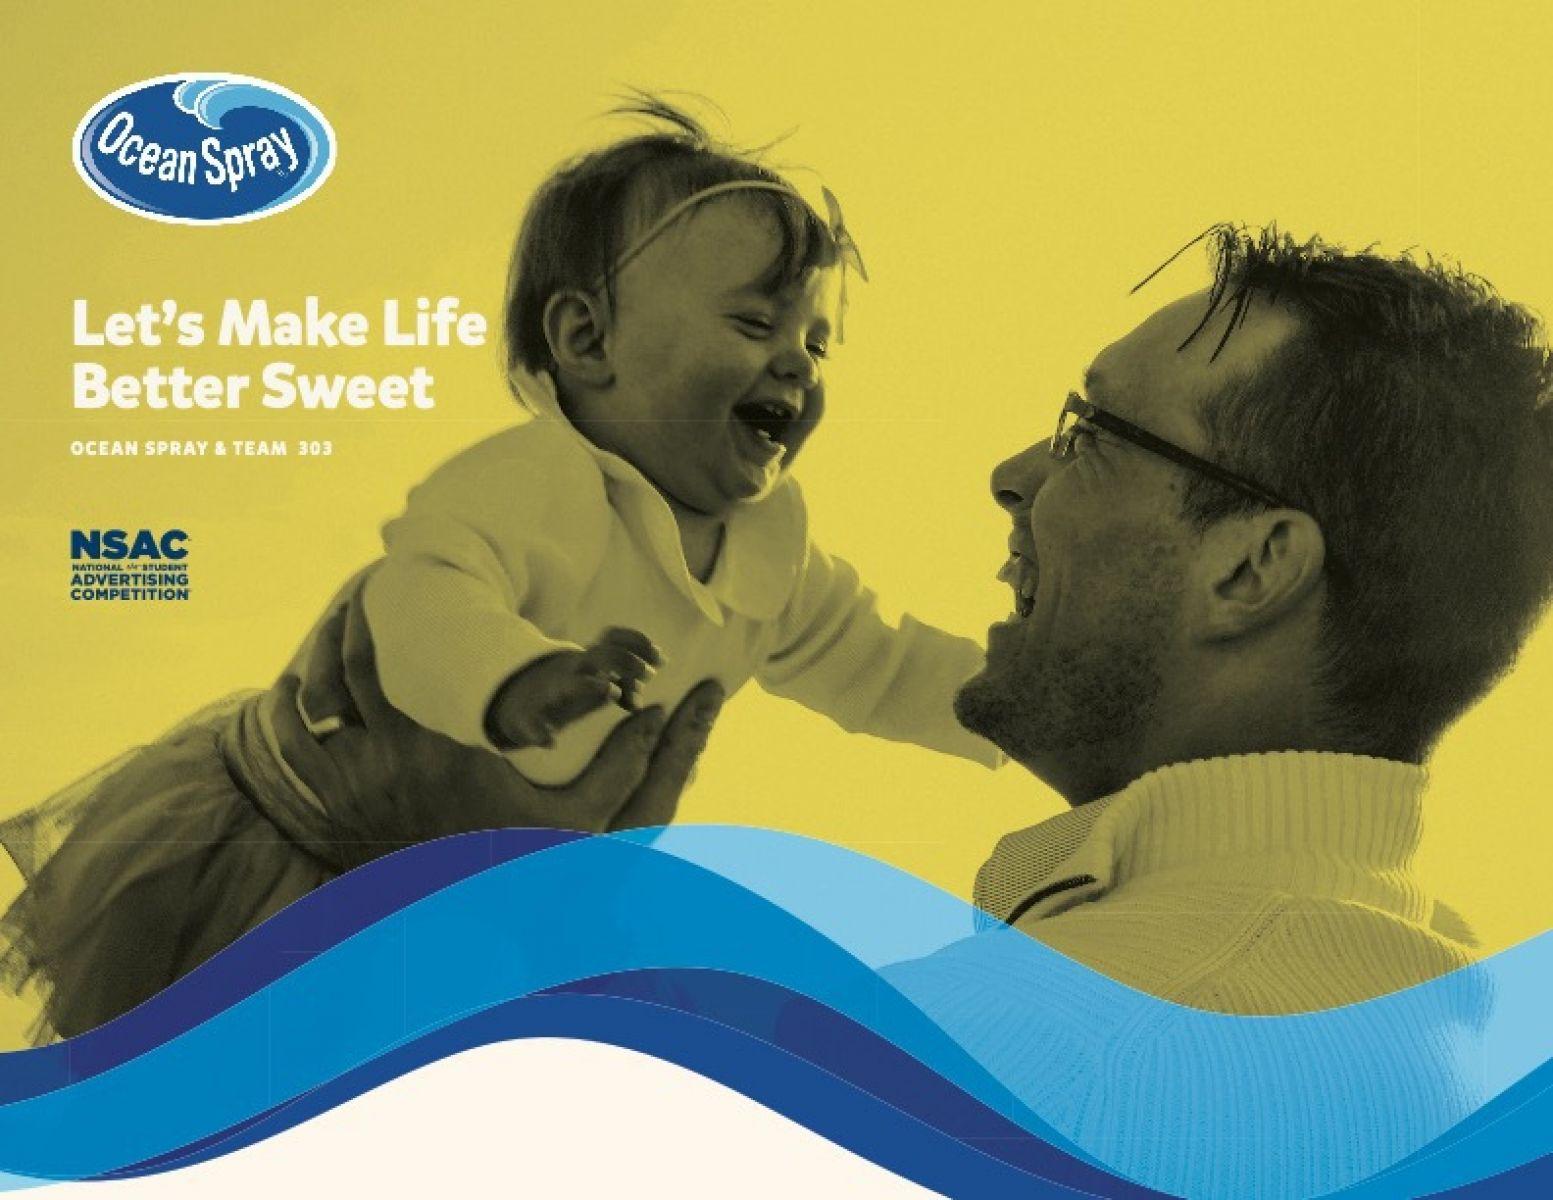 Lets_Make_Life_Better_Sweet-01-65